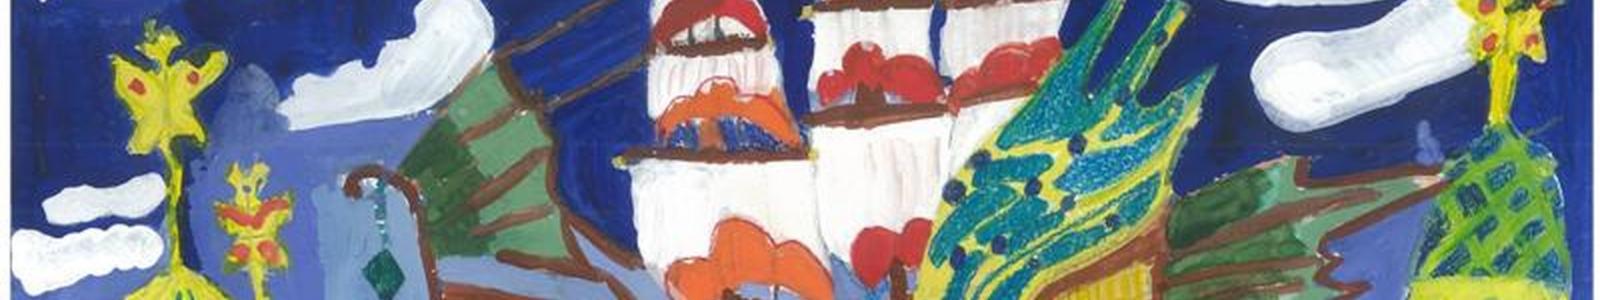 Gallery Graphic artist Olga Chernova